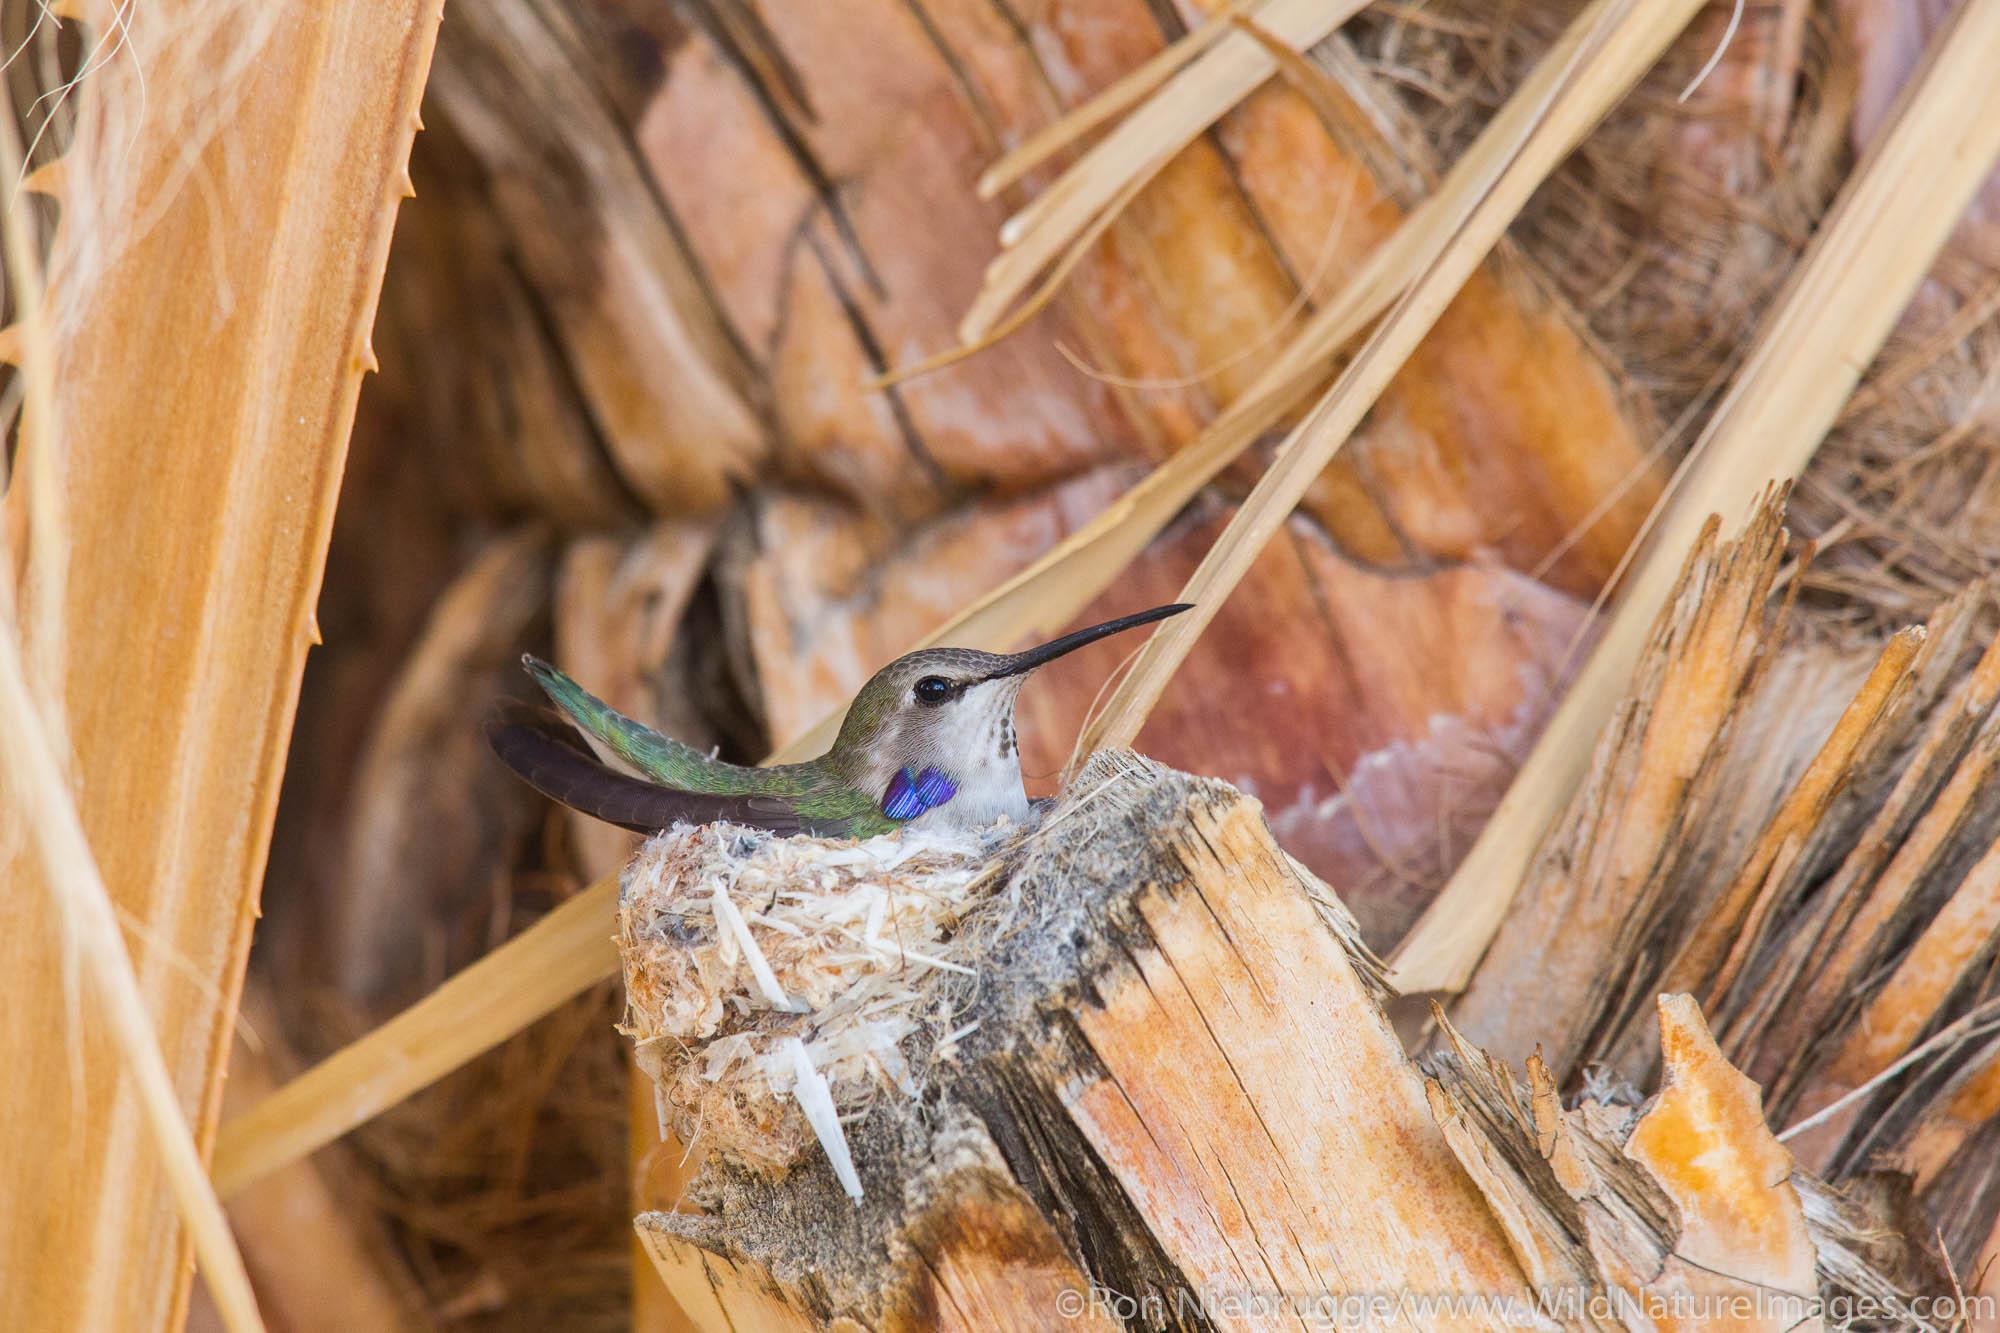 Nesting Anna's humming bird, Anza-Borrego Desert State Park, California.